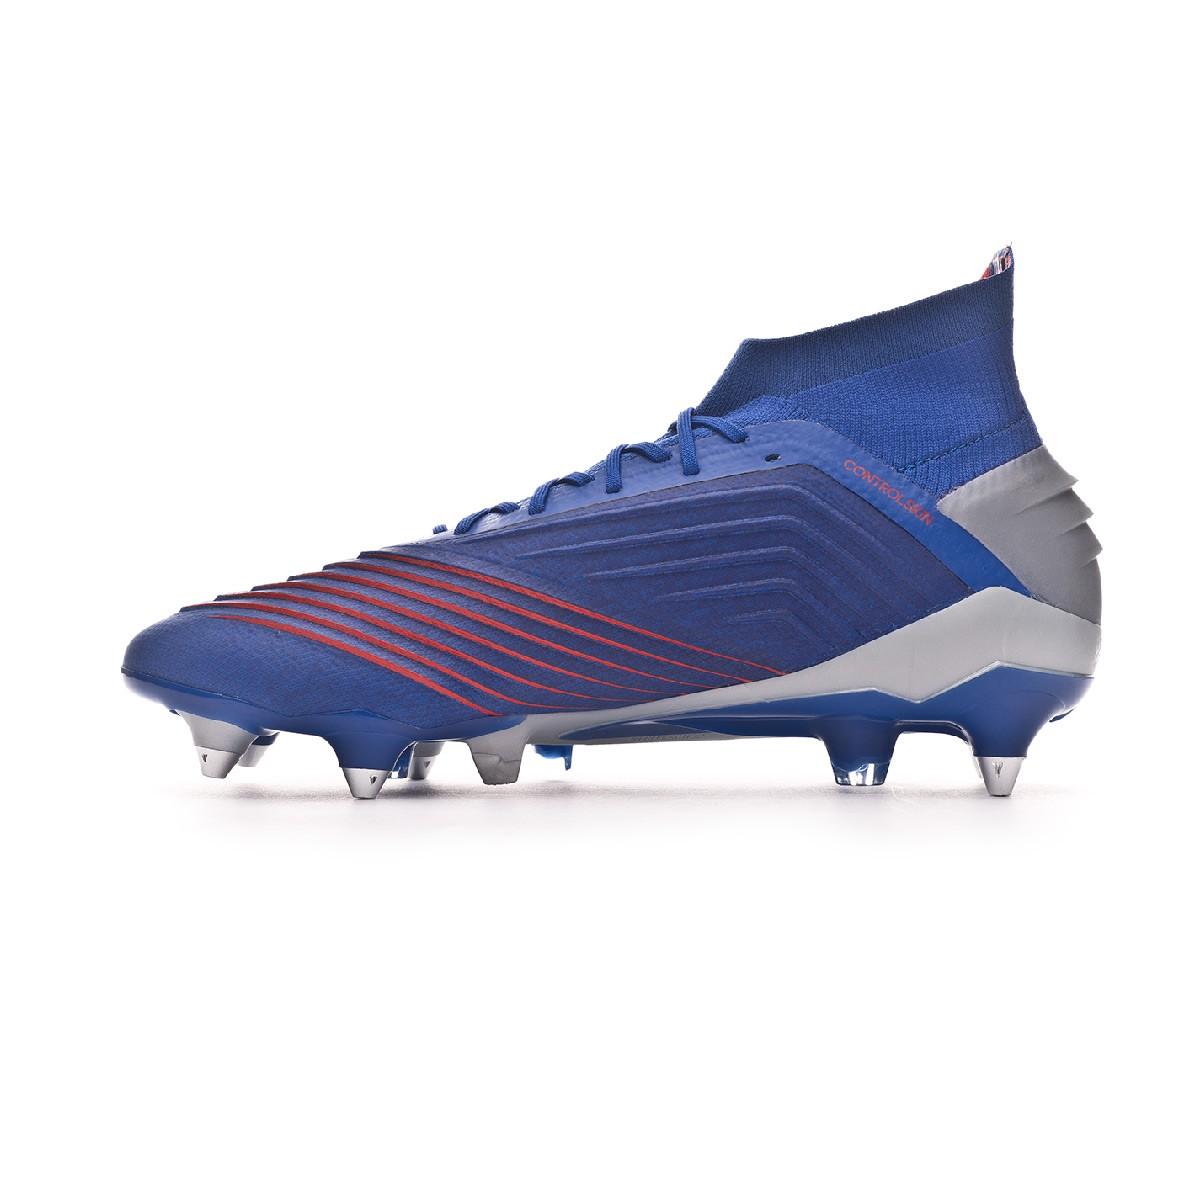 Chaussure de foot adidas Predator 19.1 SG